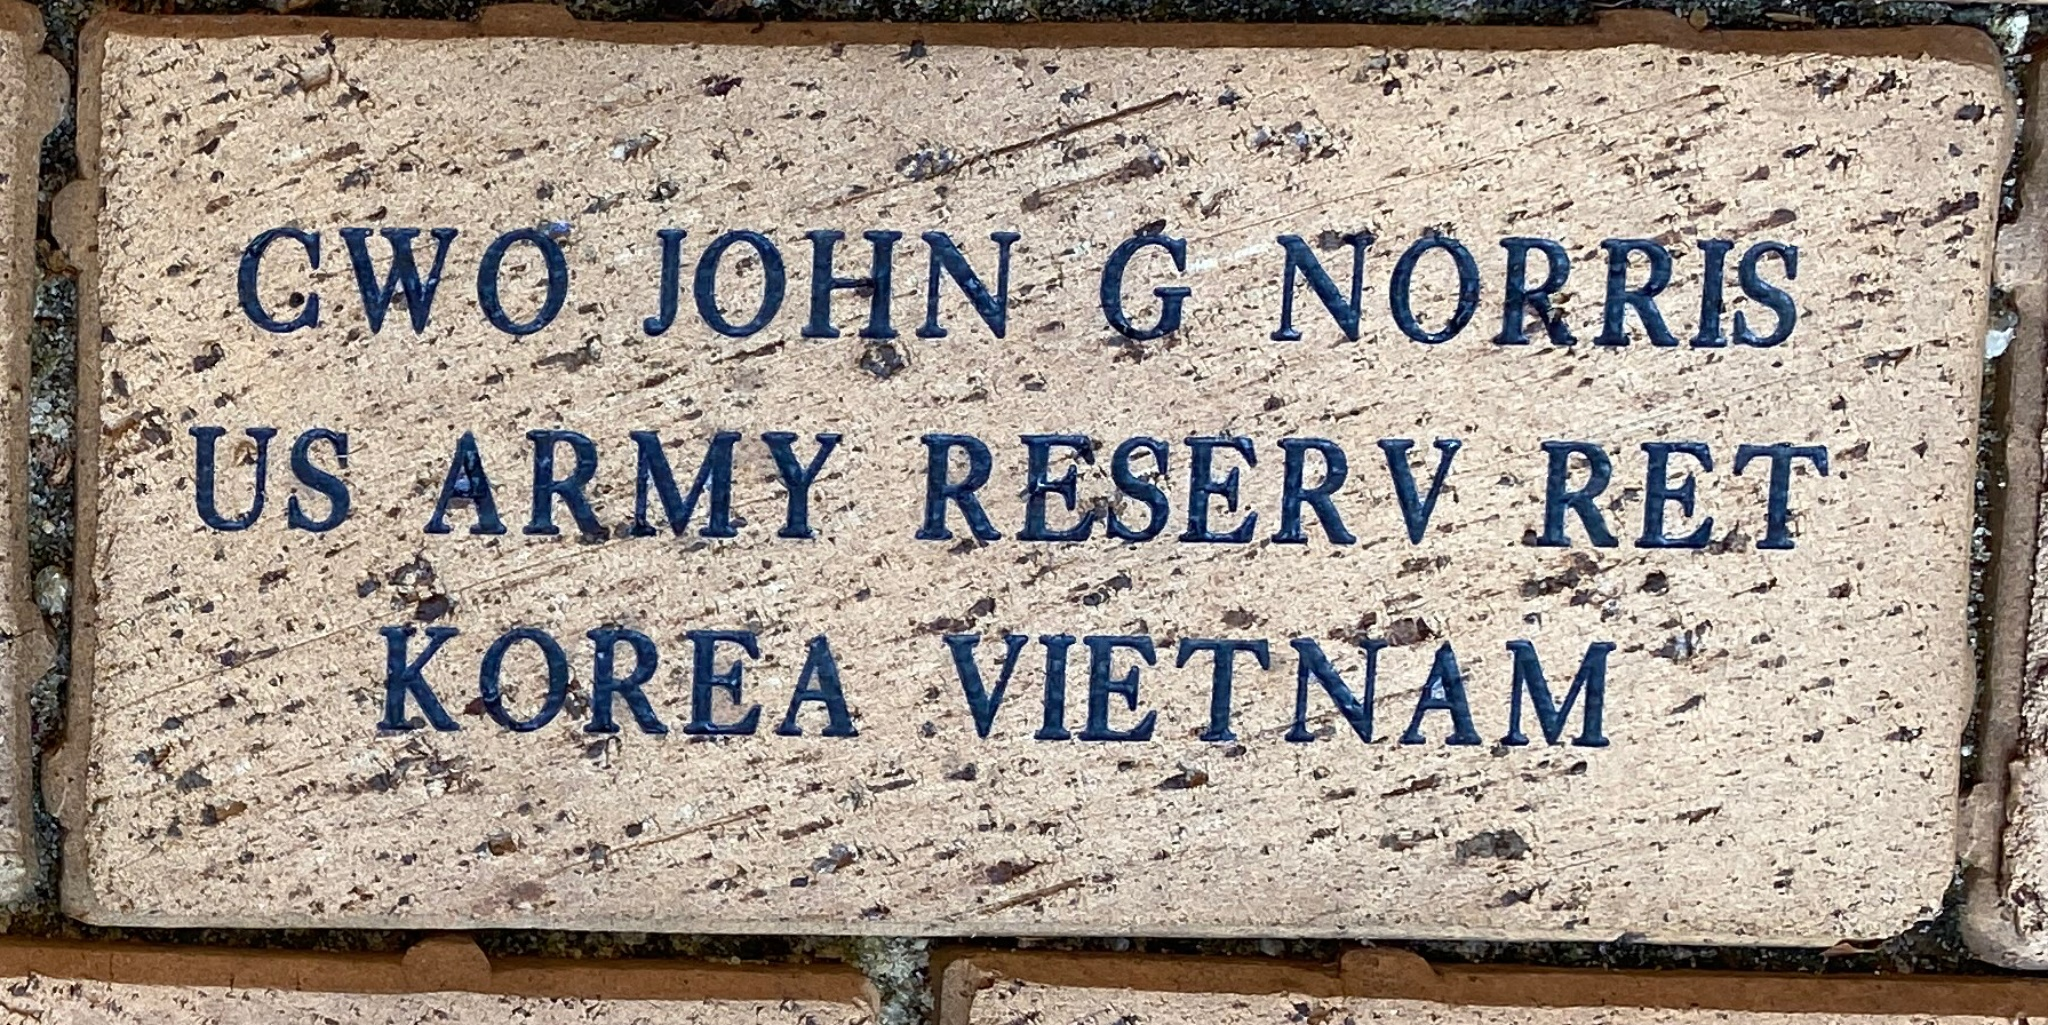 CWO JOHN G NORRIS U S ARMY RESERV RET KOREA VIETNAM